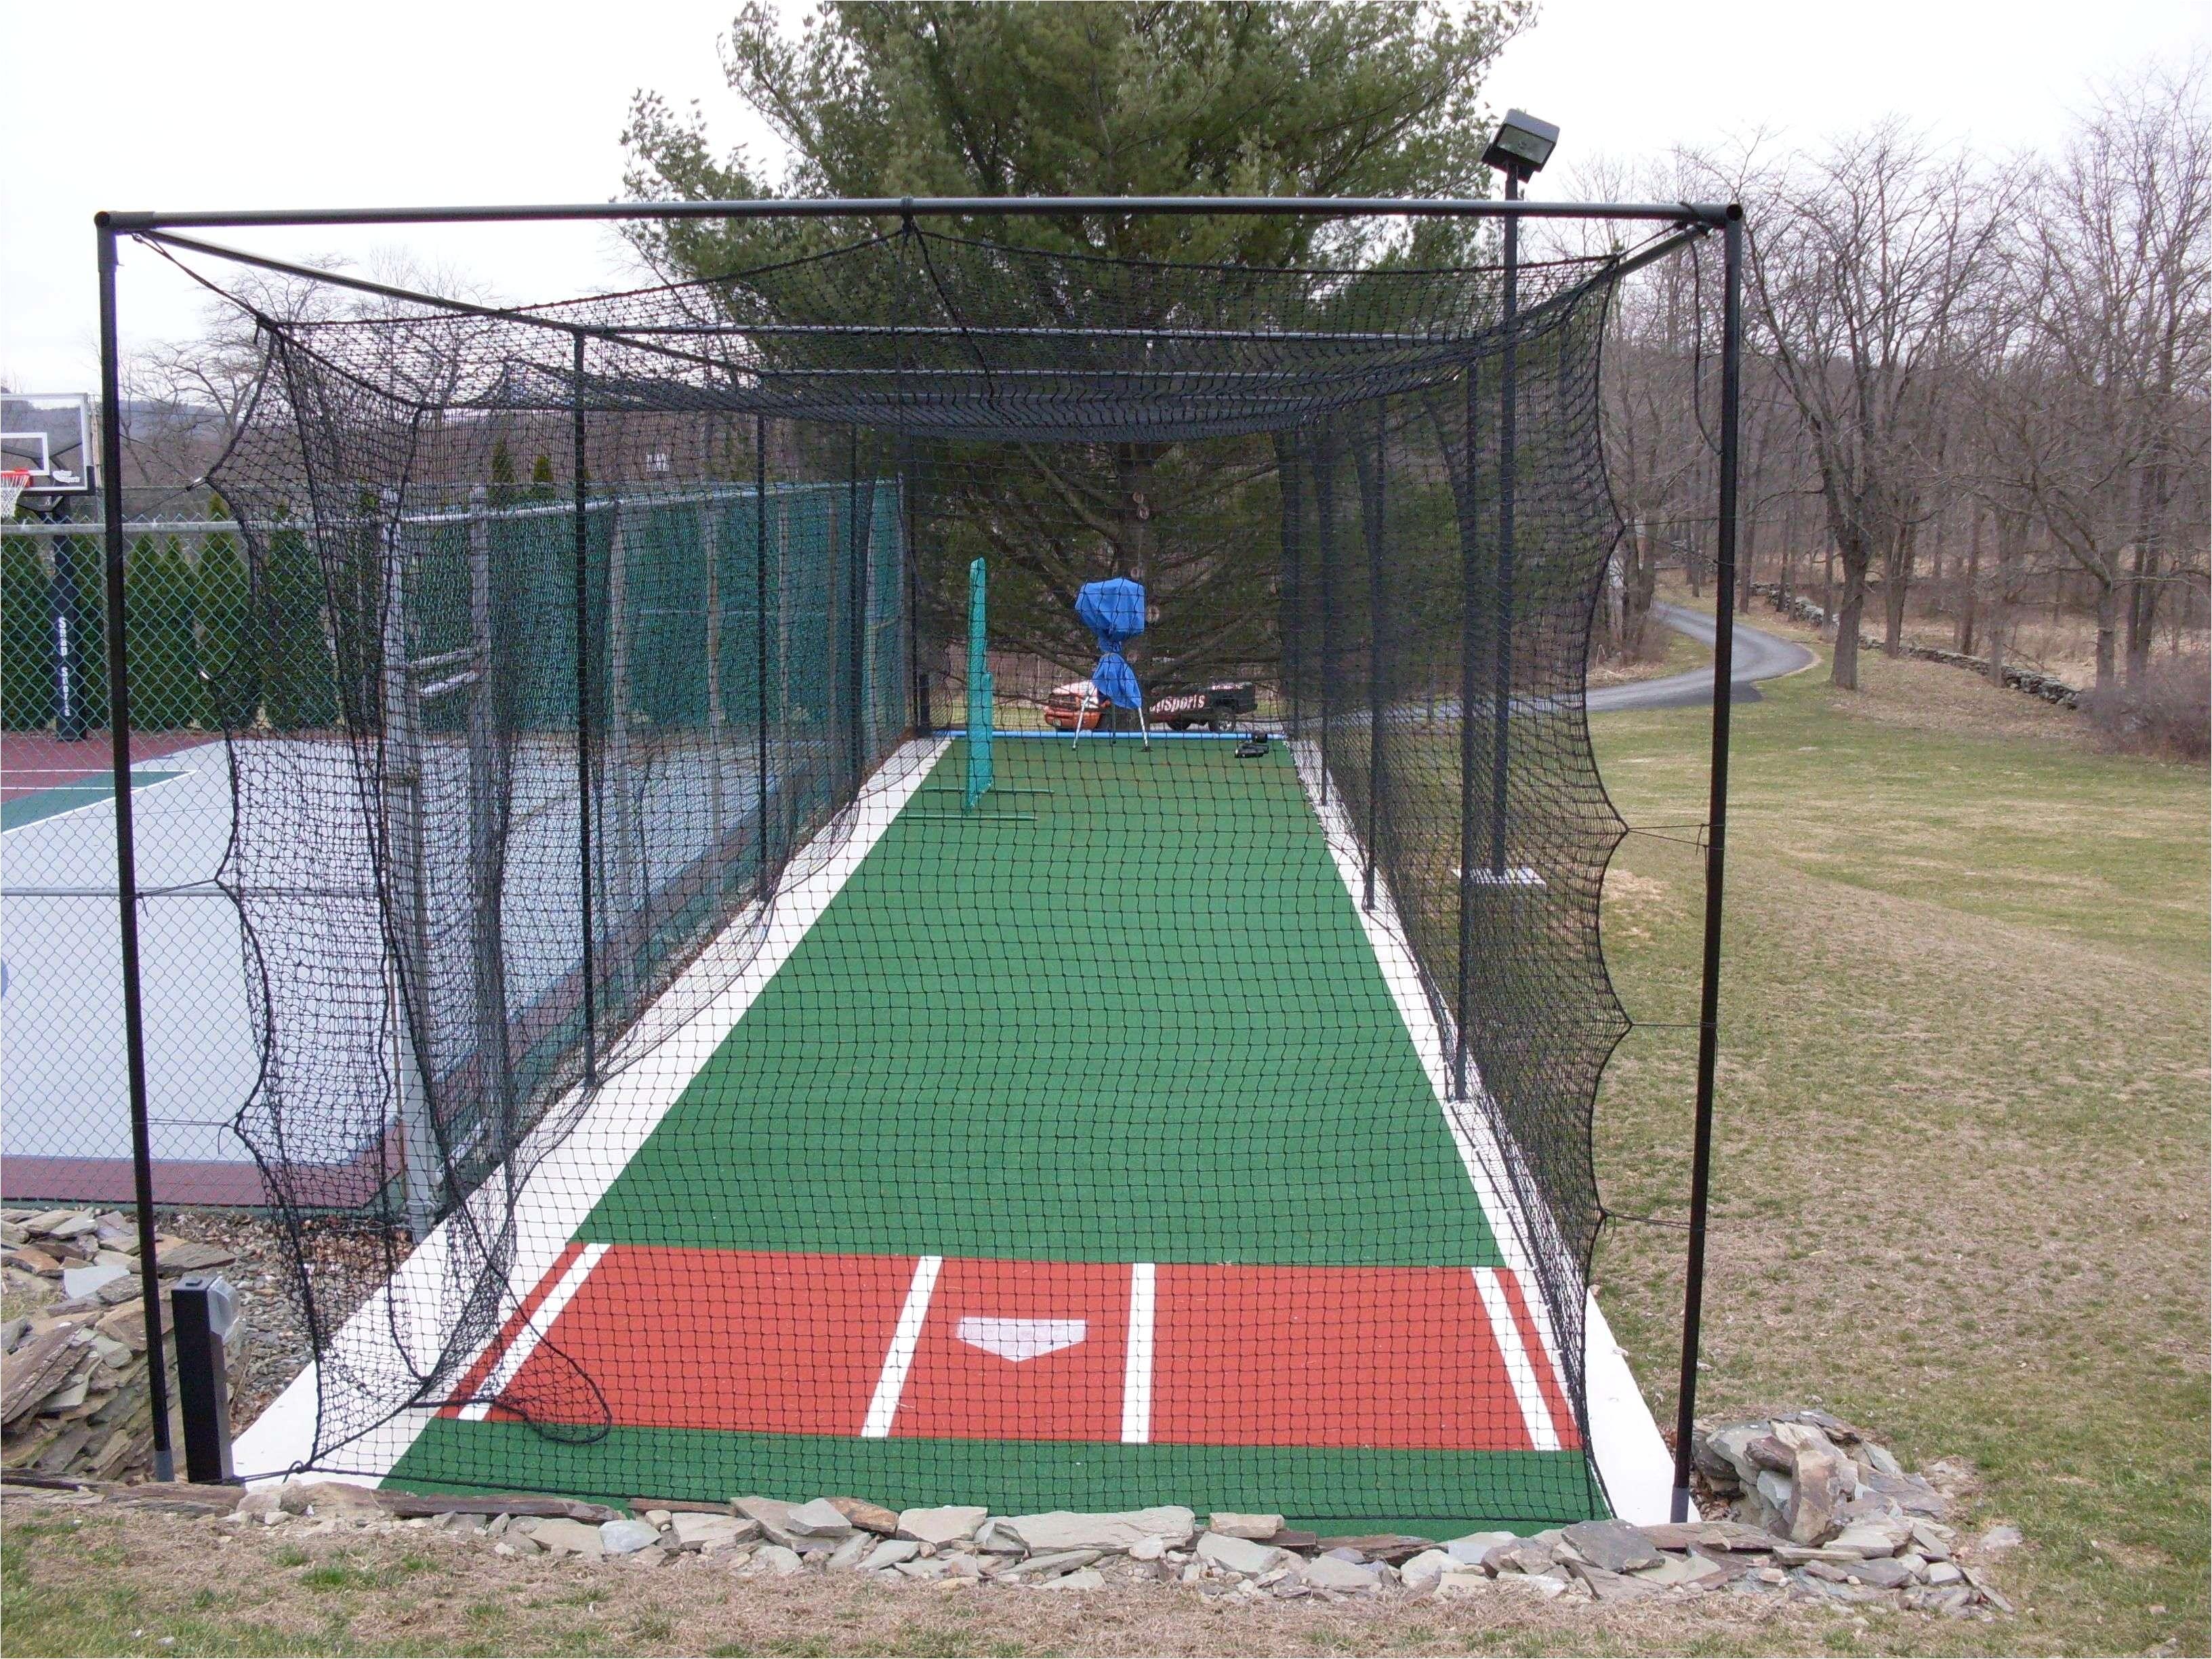 backyard basketball court and batting cage new residential batting cage sportprosusa baseball of backyard basketball court